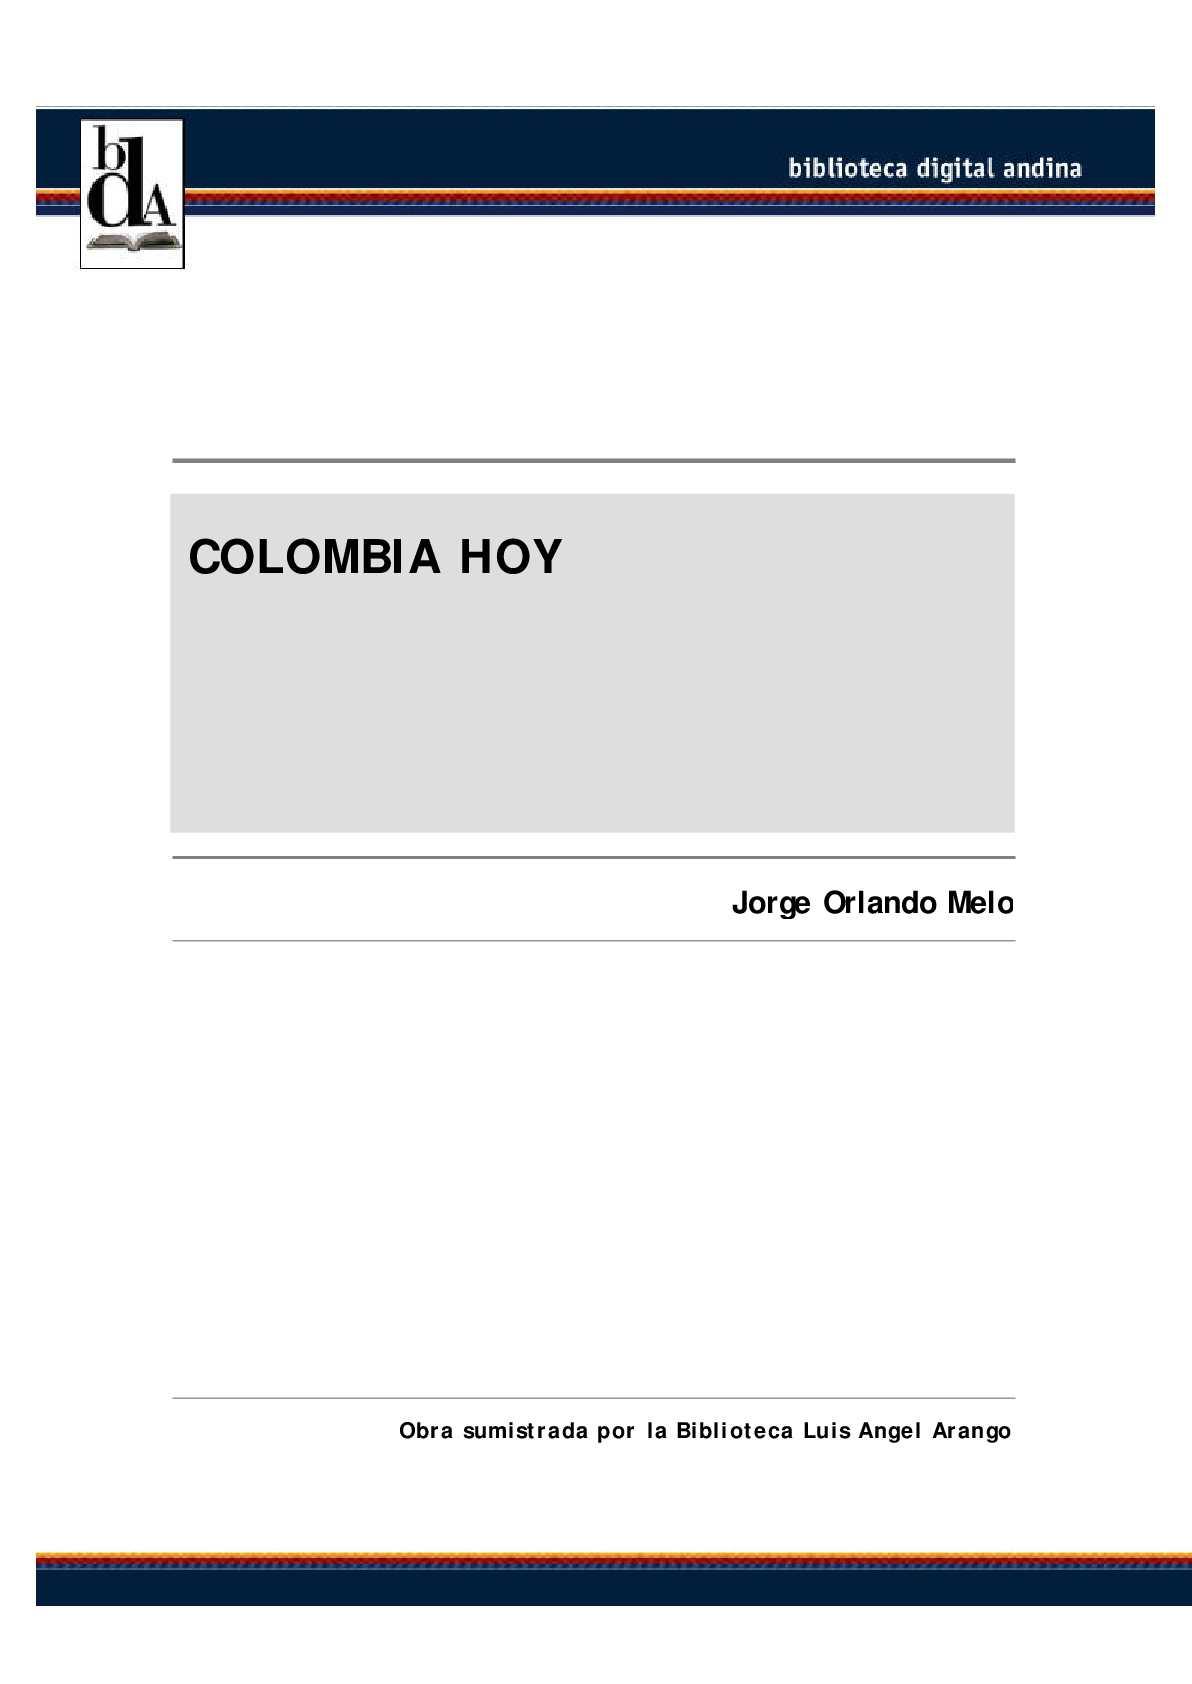 Calaméo - Reseña historica de colombia